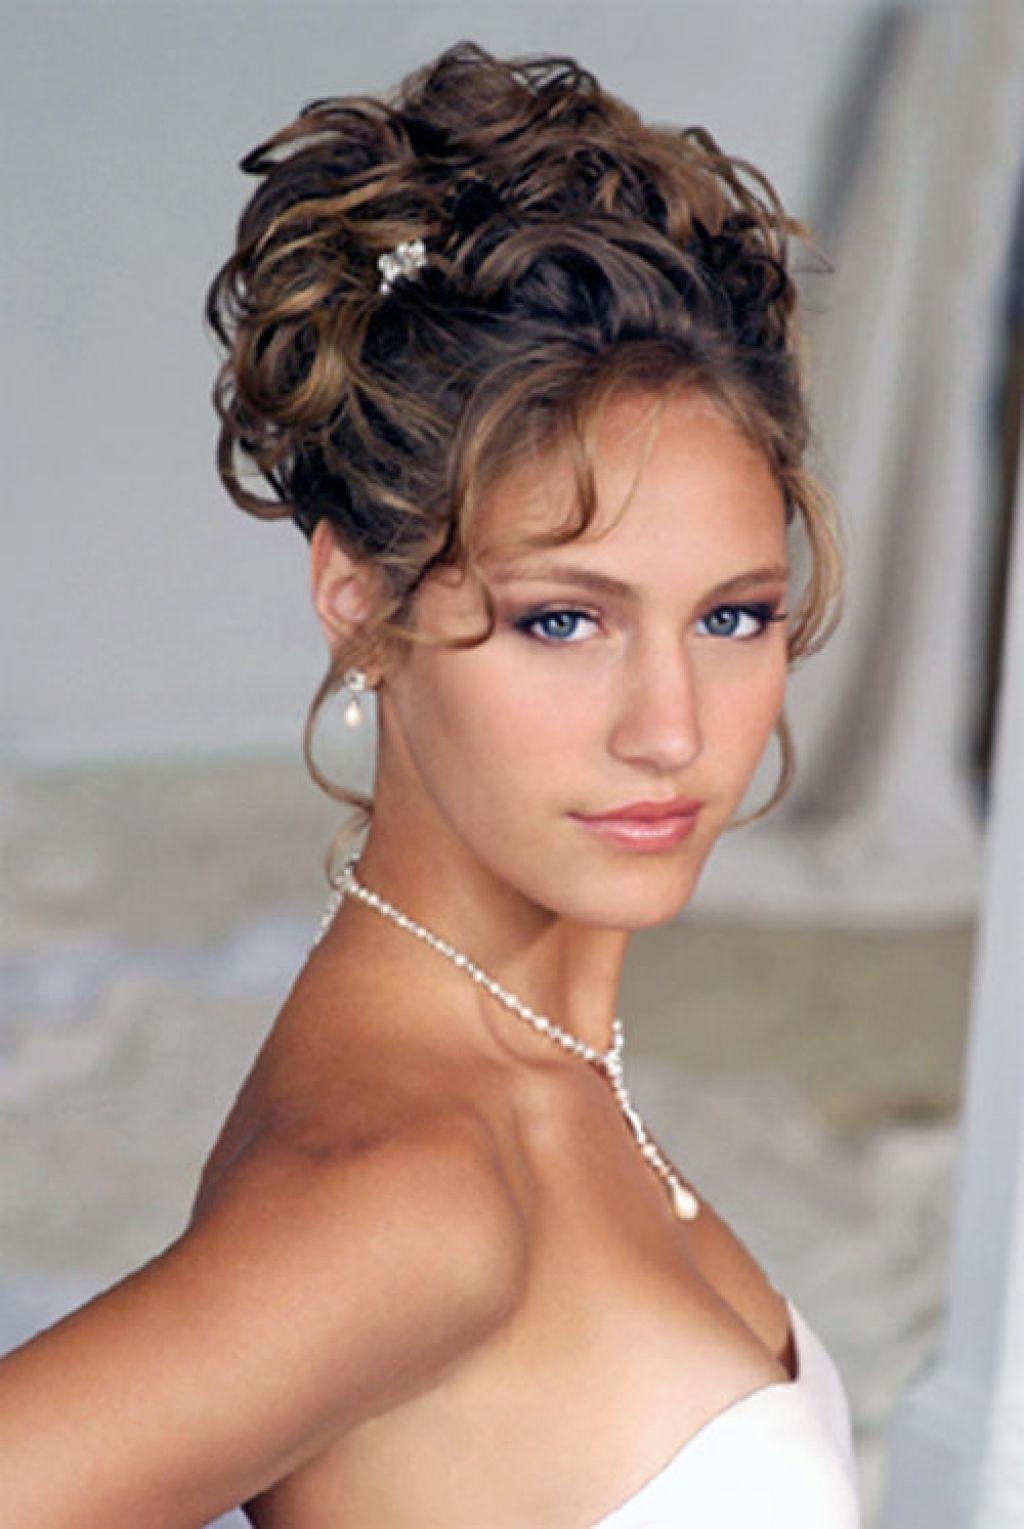 Wedding Hair Updos Medium Length Hairstyles – Popular Long Hairstyle For Wedding Updos For Medium Length Hair (View 11 of 15)